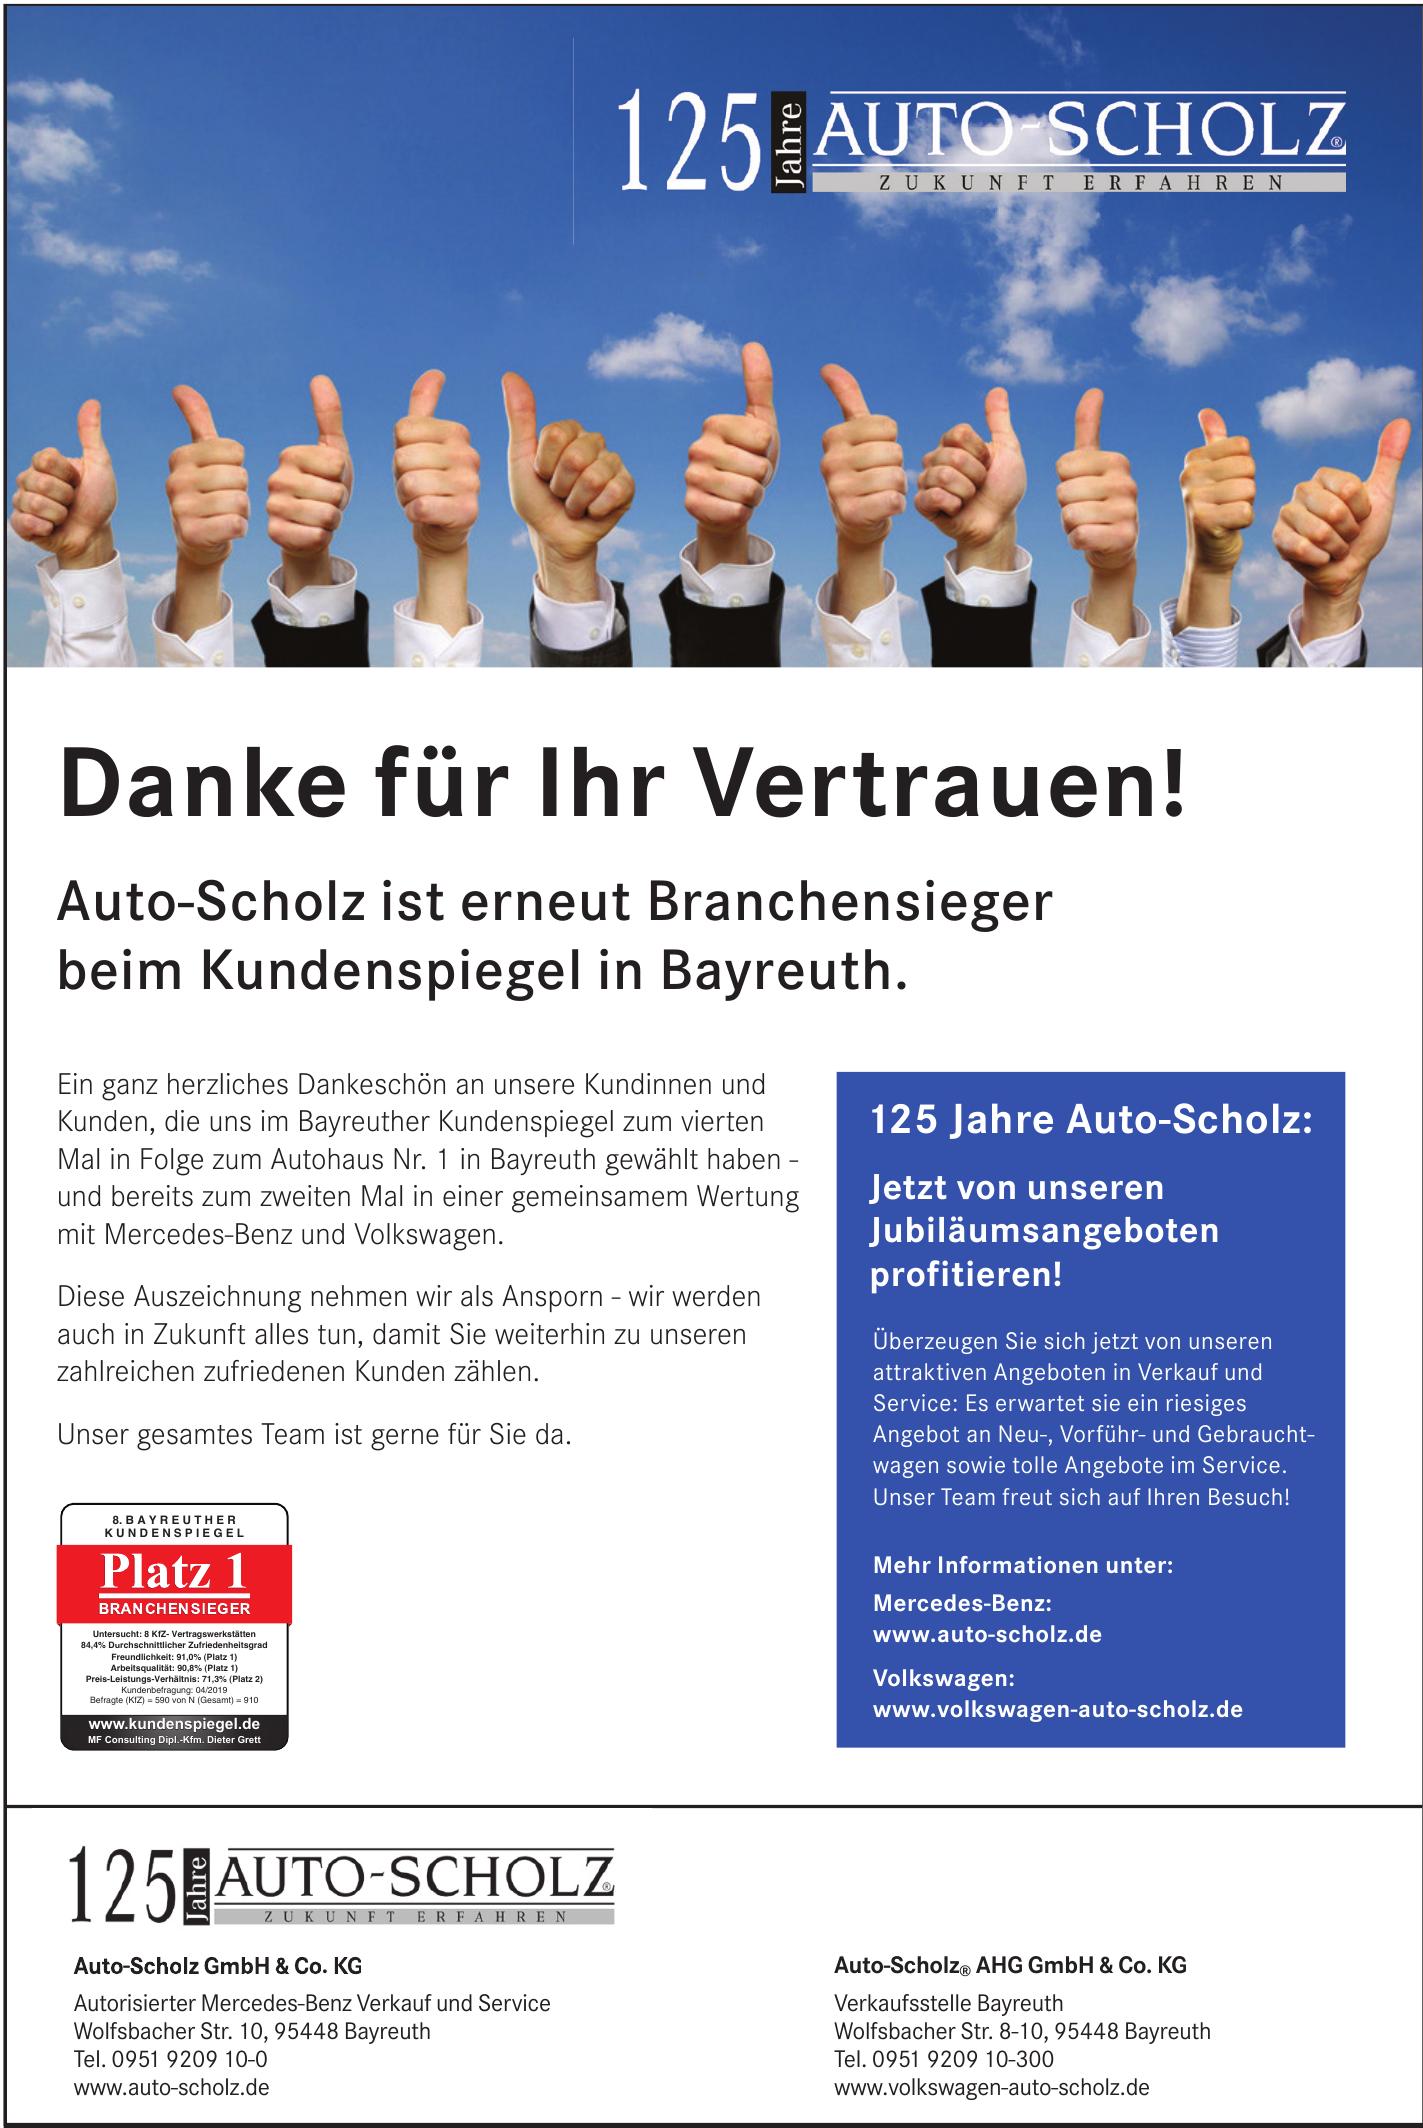 Auto-Scholz® AHG GmbH & Co. KG